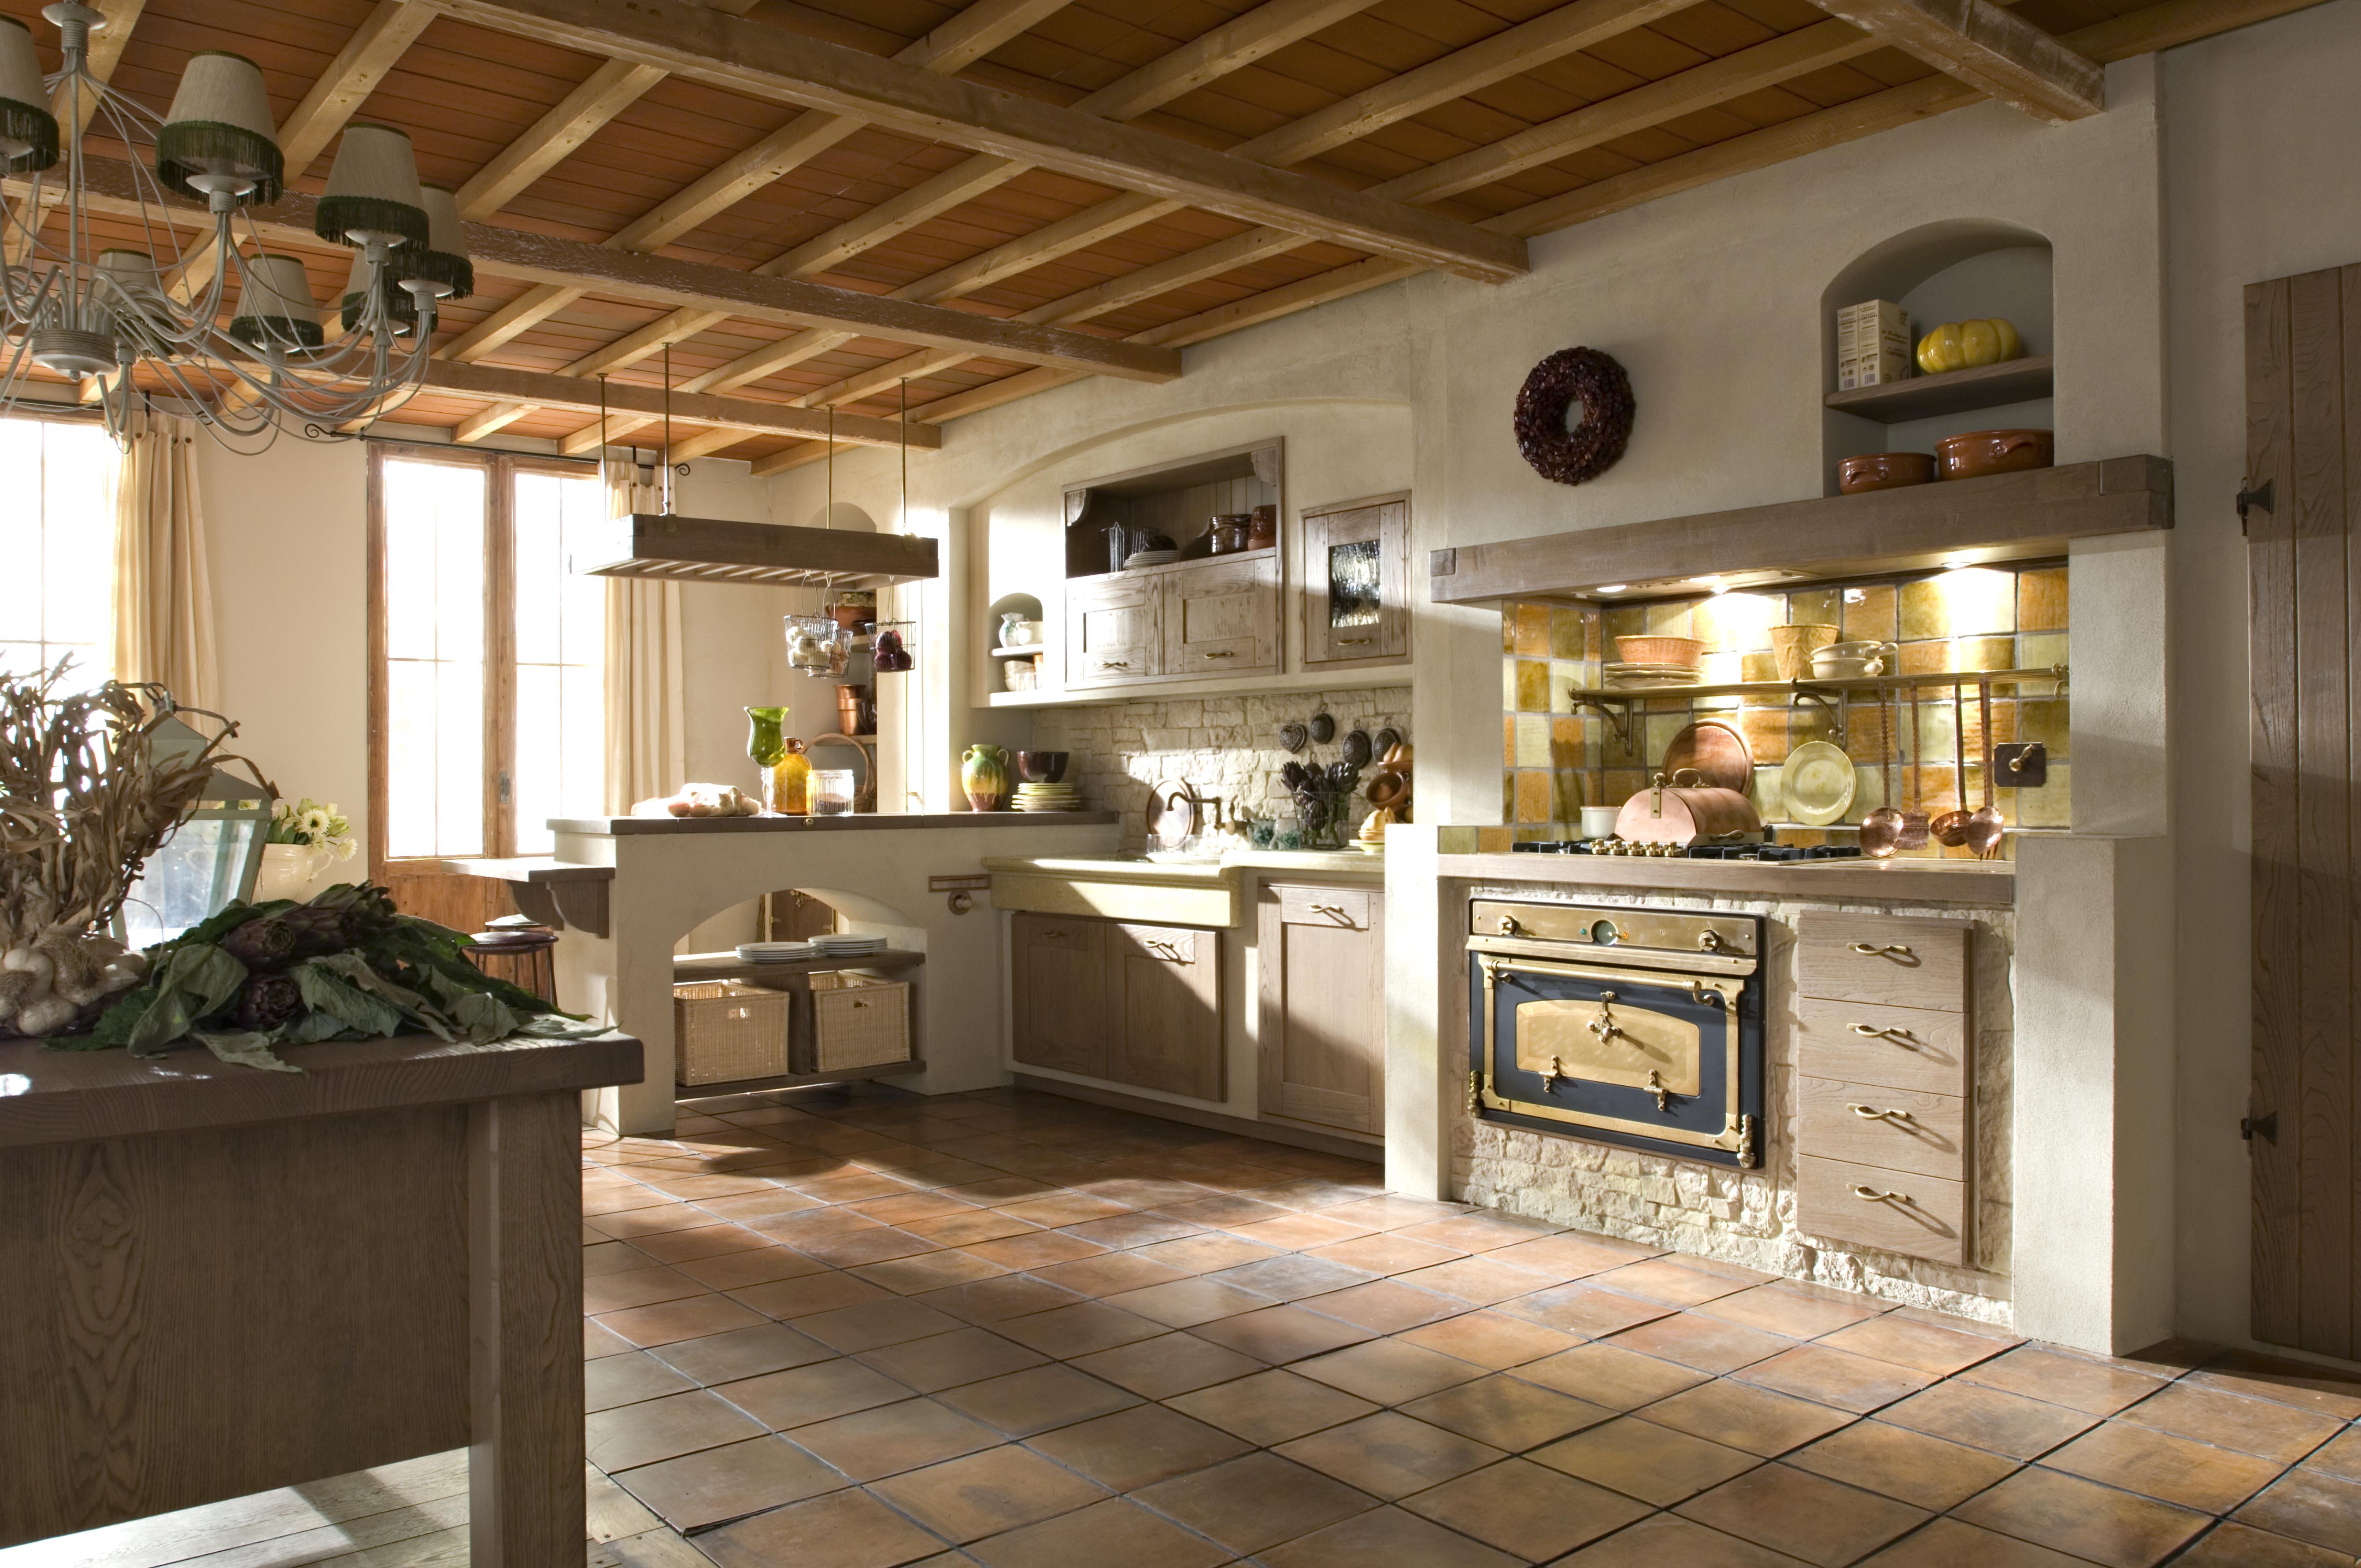 Stunning Aurora Cucine Prezzi Ideas - acrylicgiftware.us ...